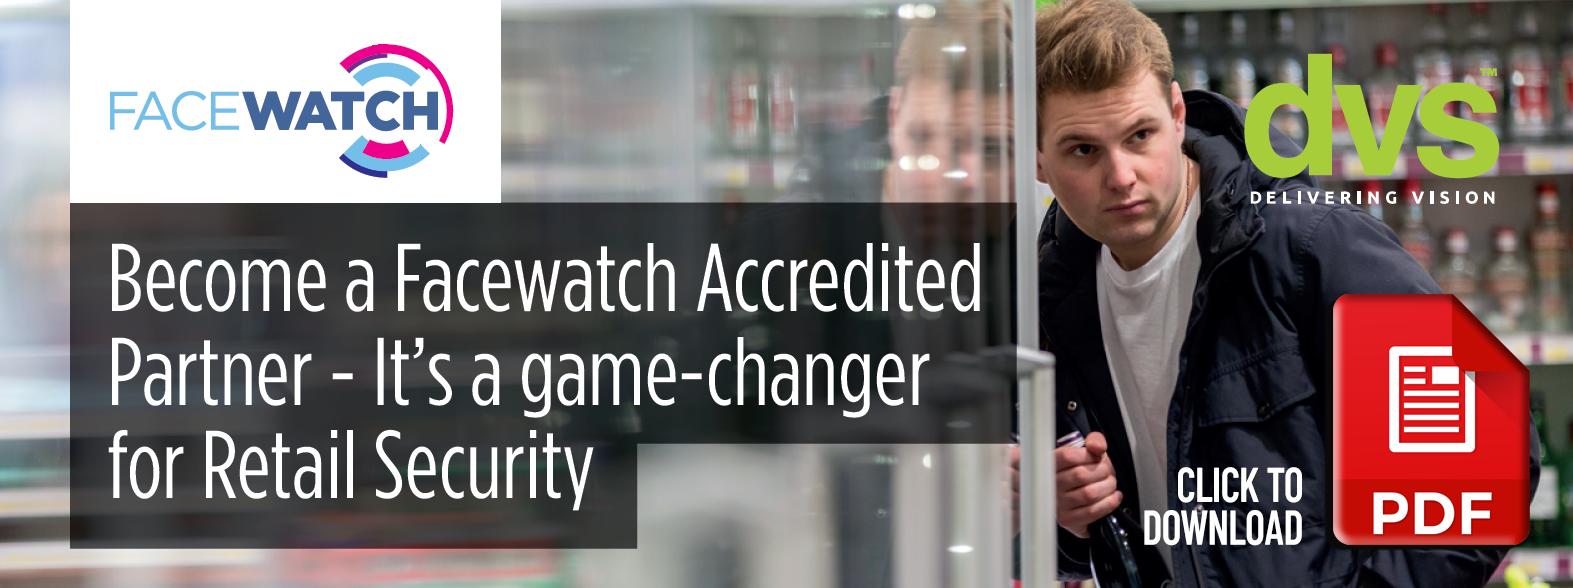 Become a Facewatch Partner